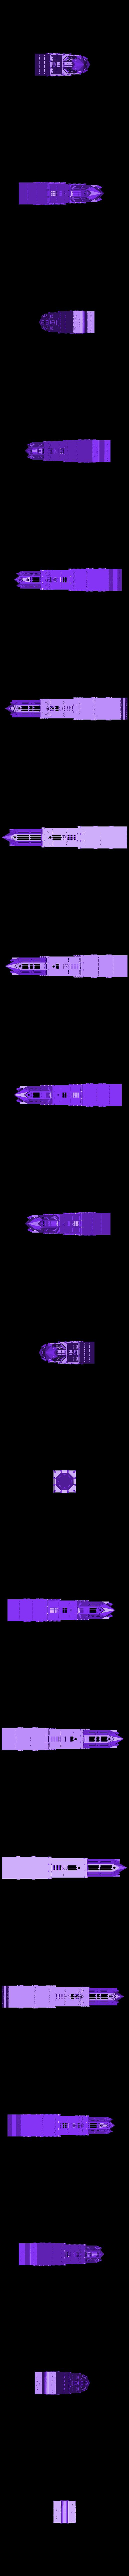 dom_tower_utrecht_01.stl Download STL file Dom Tower - Utrecht • 3D printable template, edge